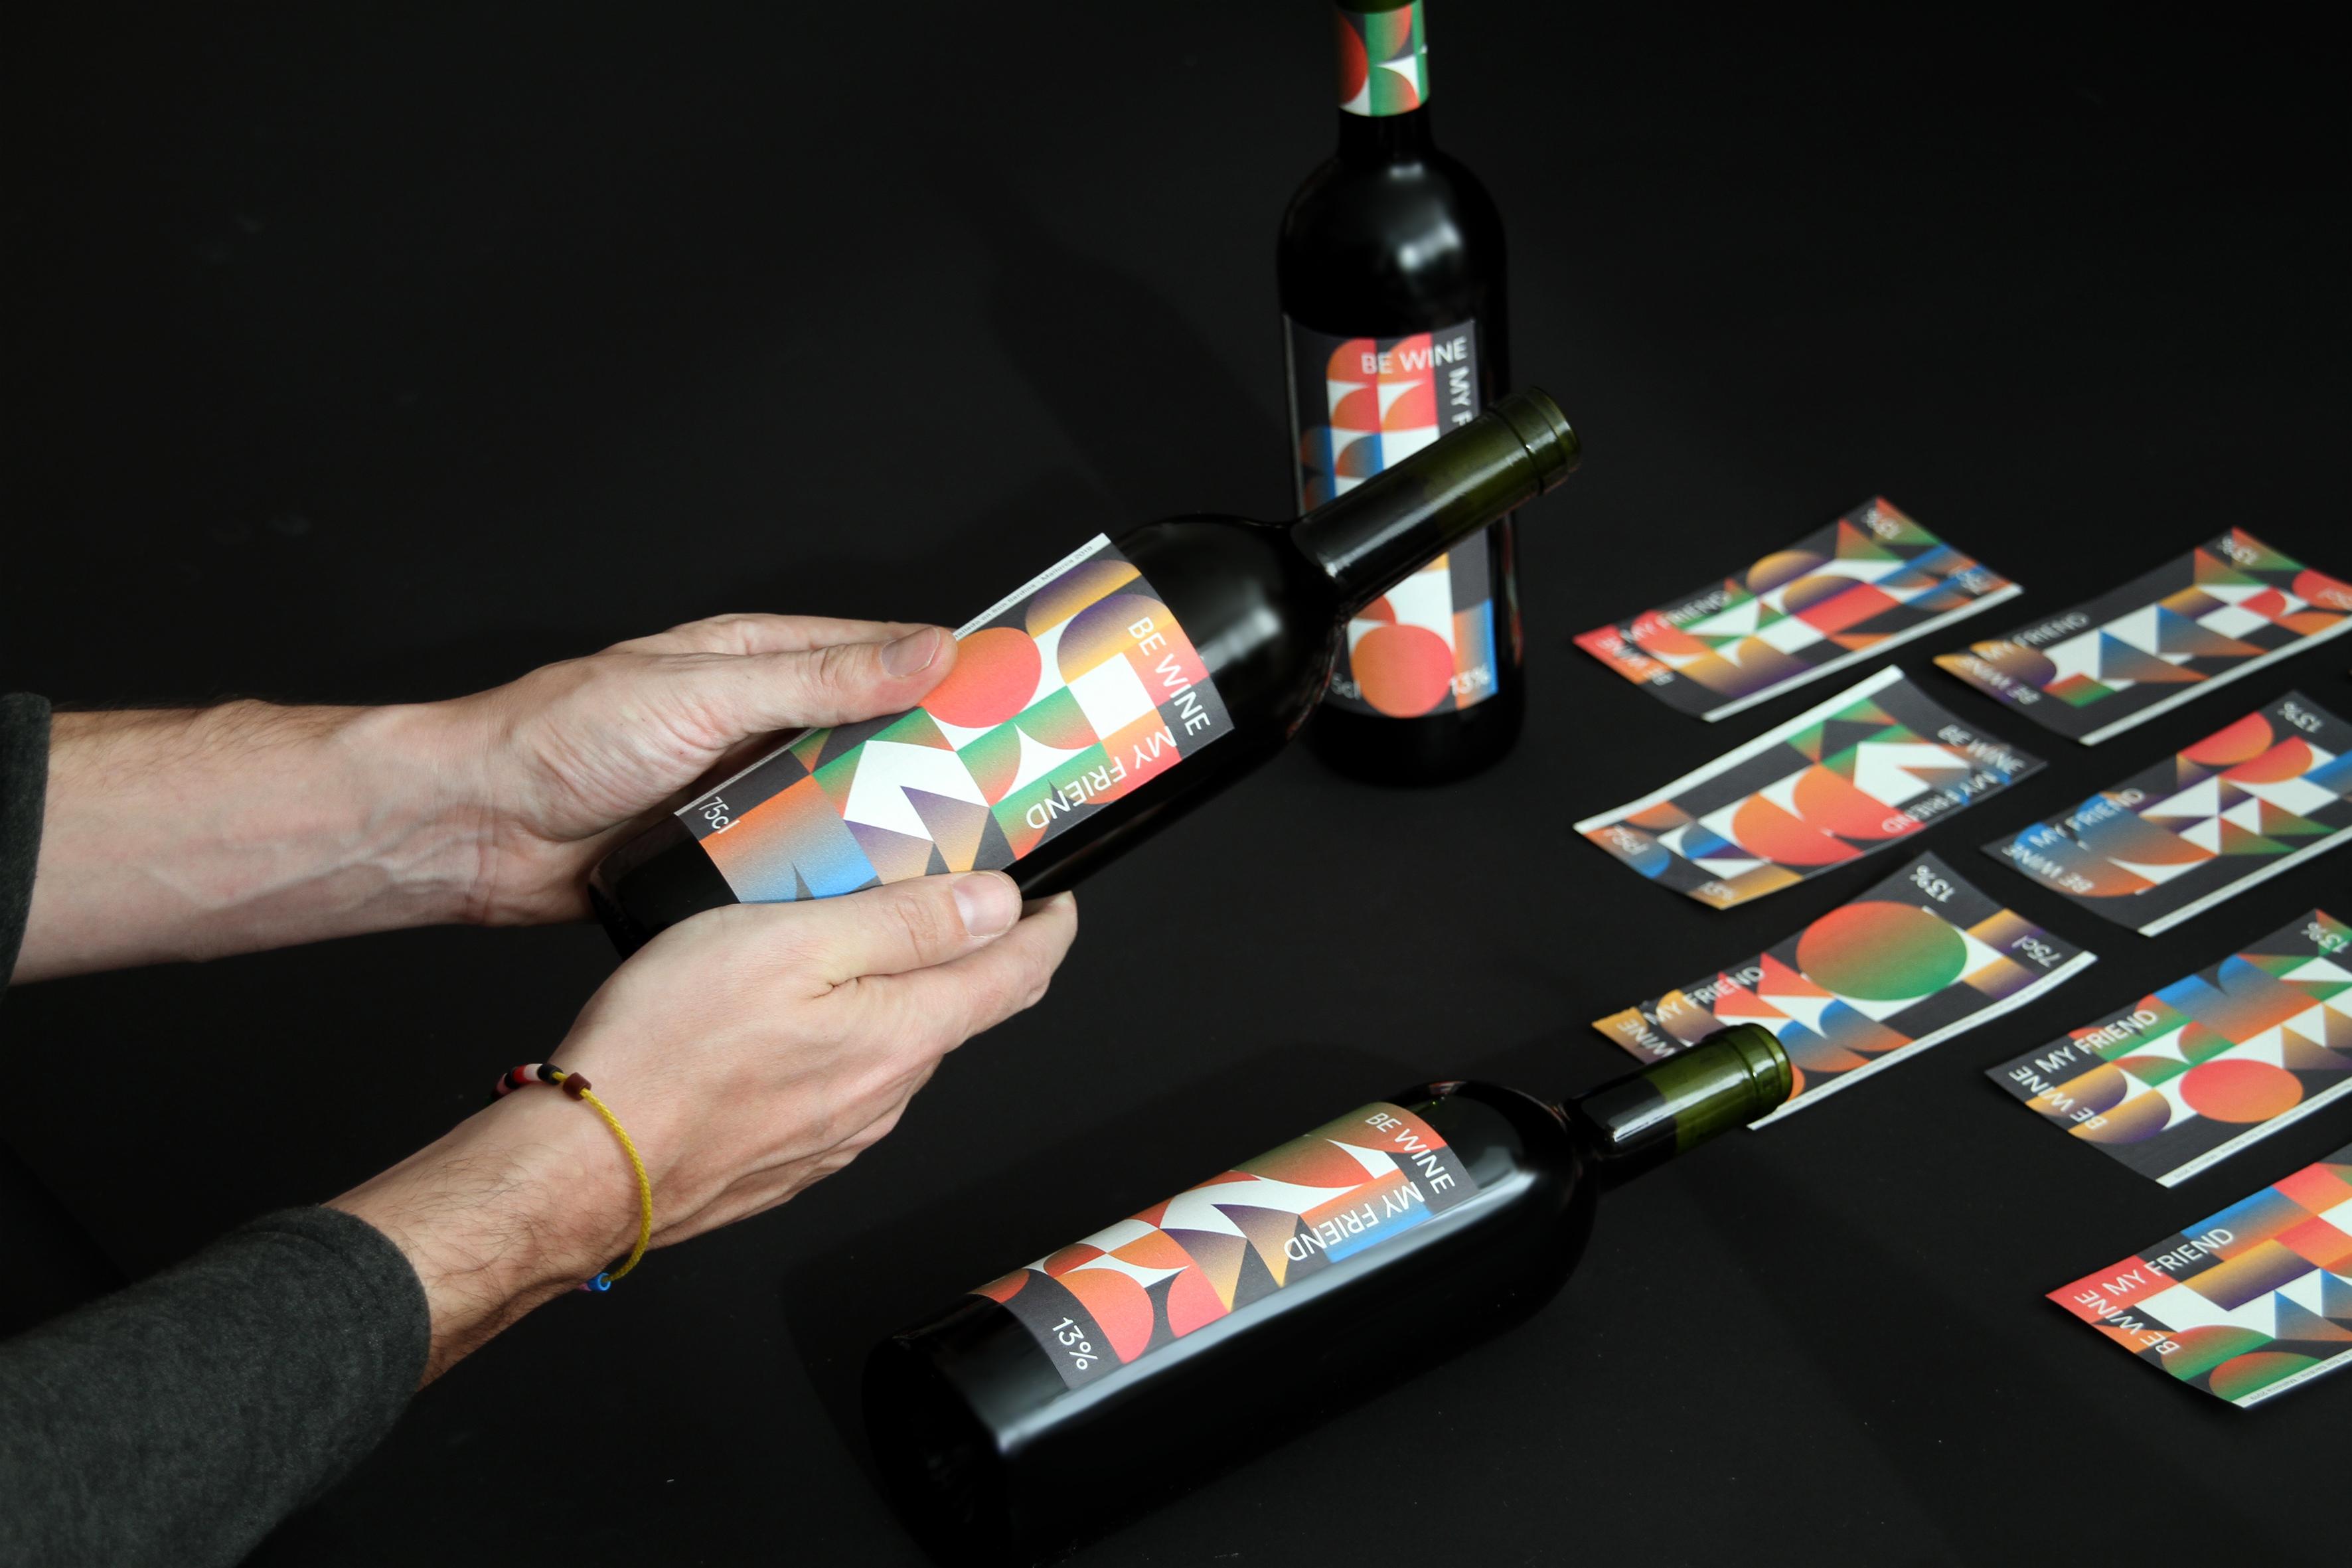 Be wine my friend by Barceló estudio - Creative Work